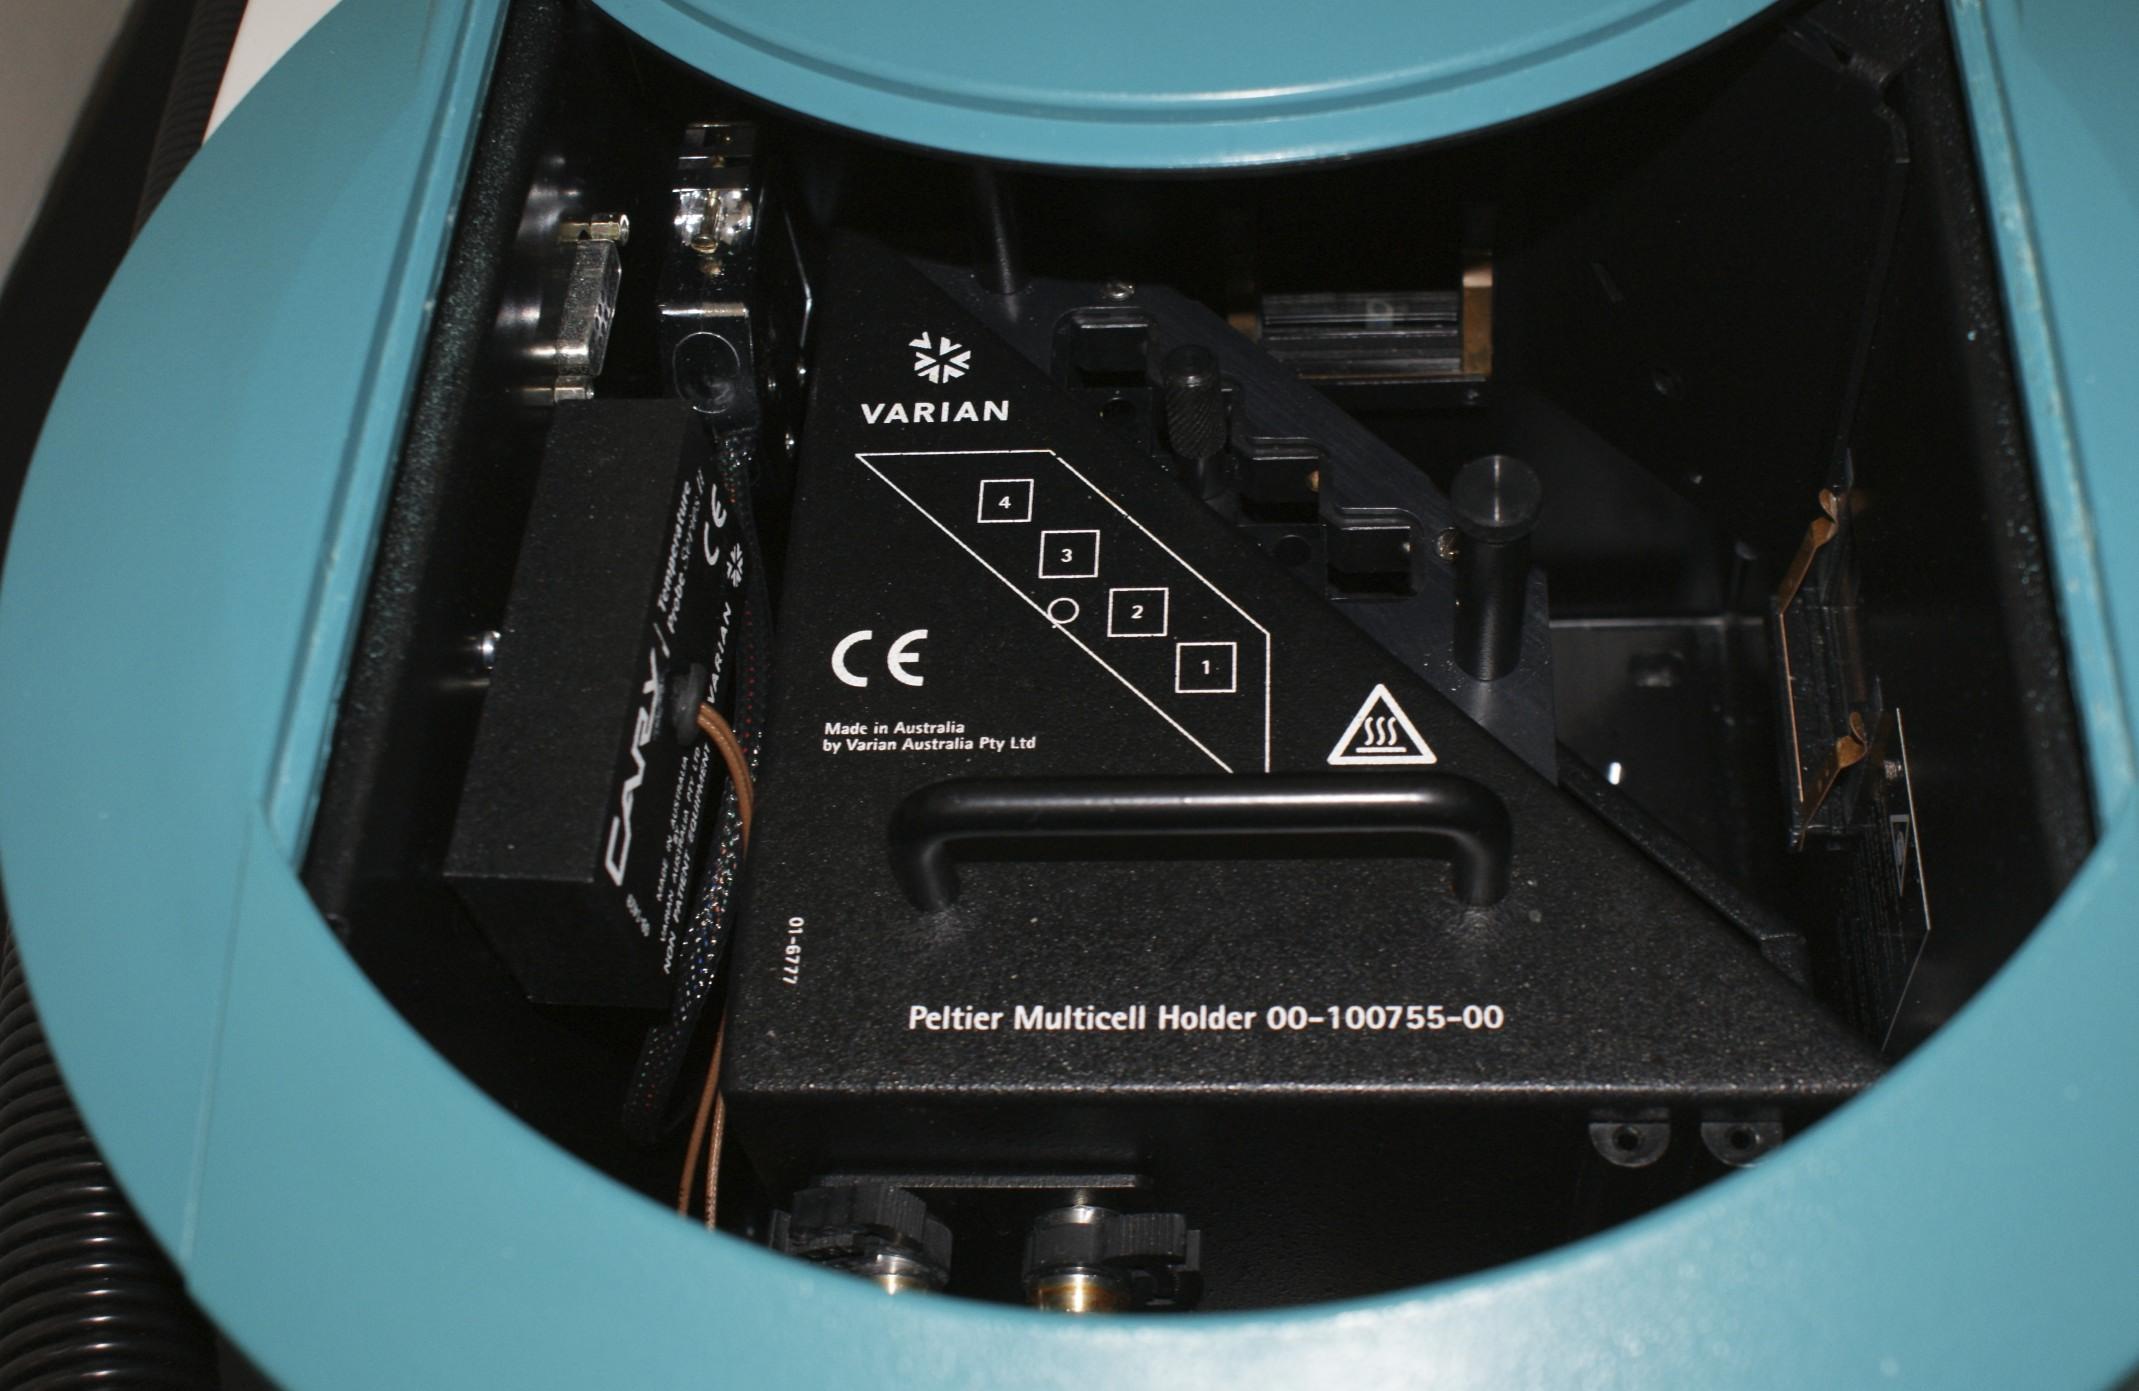 Varian Eclipse Fluorescence Spectrophotometer with Varian CARY Peltier Varian Peltier Multicell 4 Po